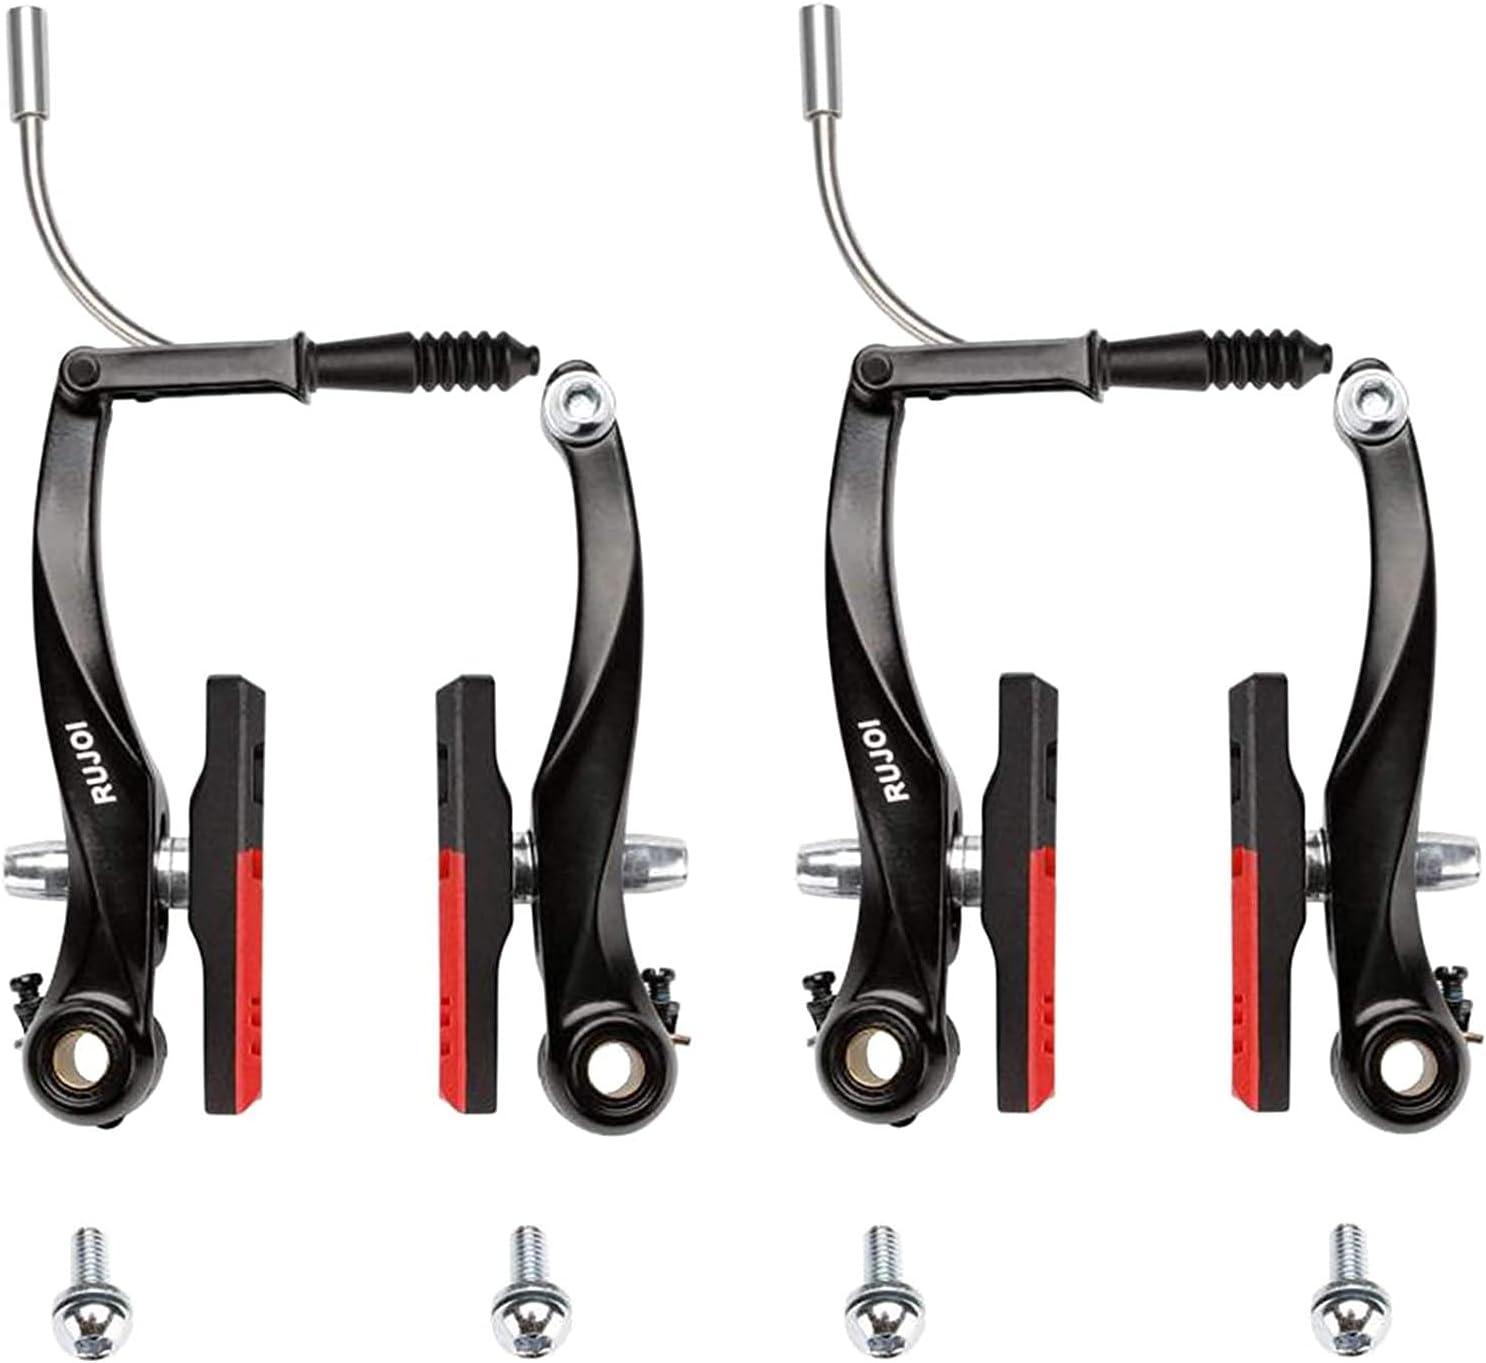 Award National uniform free shipping RUJOI Bike Brakes Set Mountain Replac V-Brake V Type